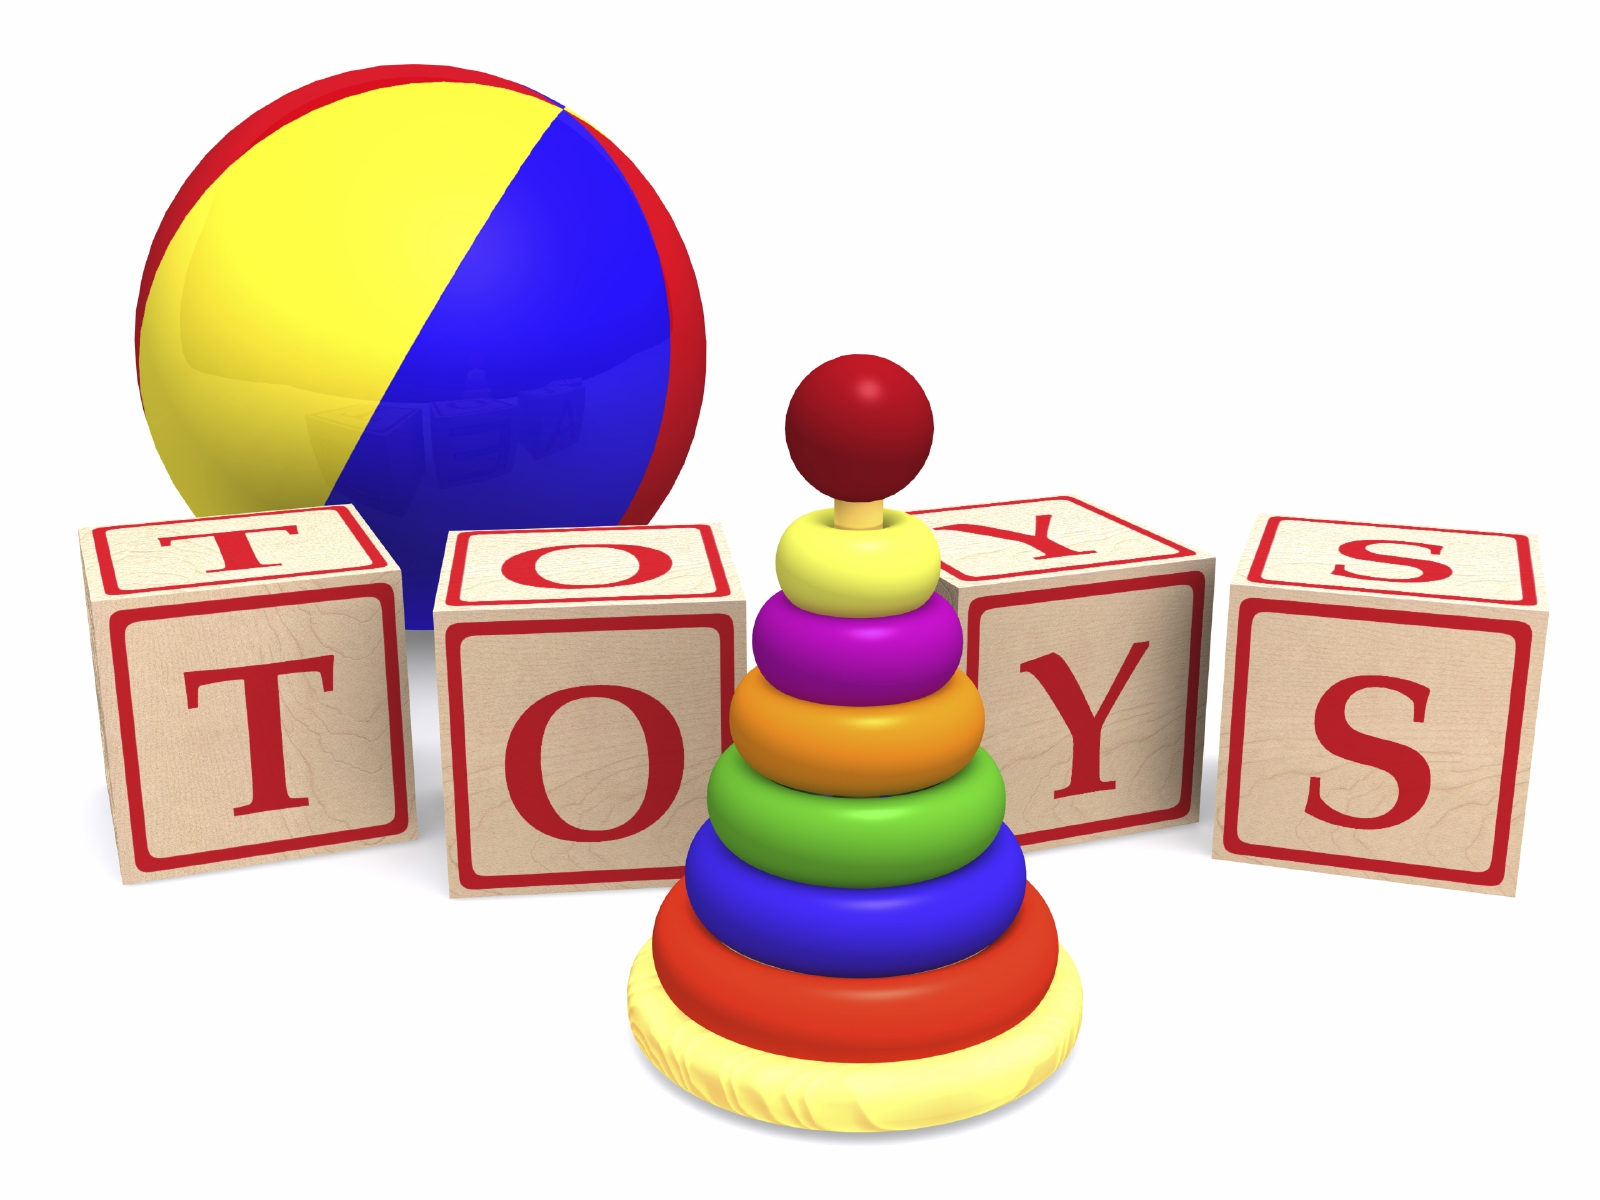 1600x1200 Kids' Toys Preparing For Adulthood Kids' Toys Corner